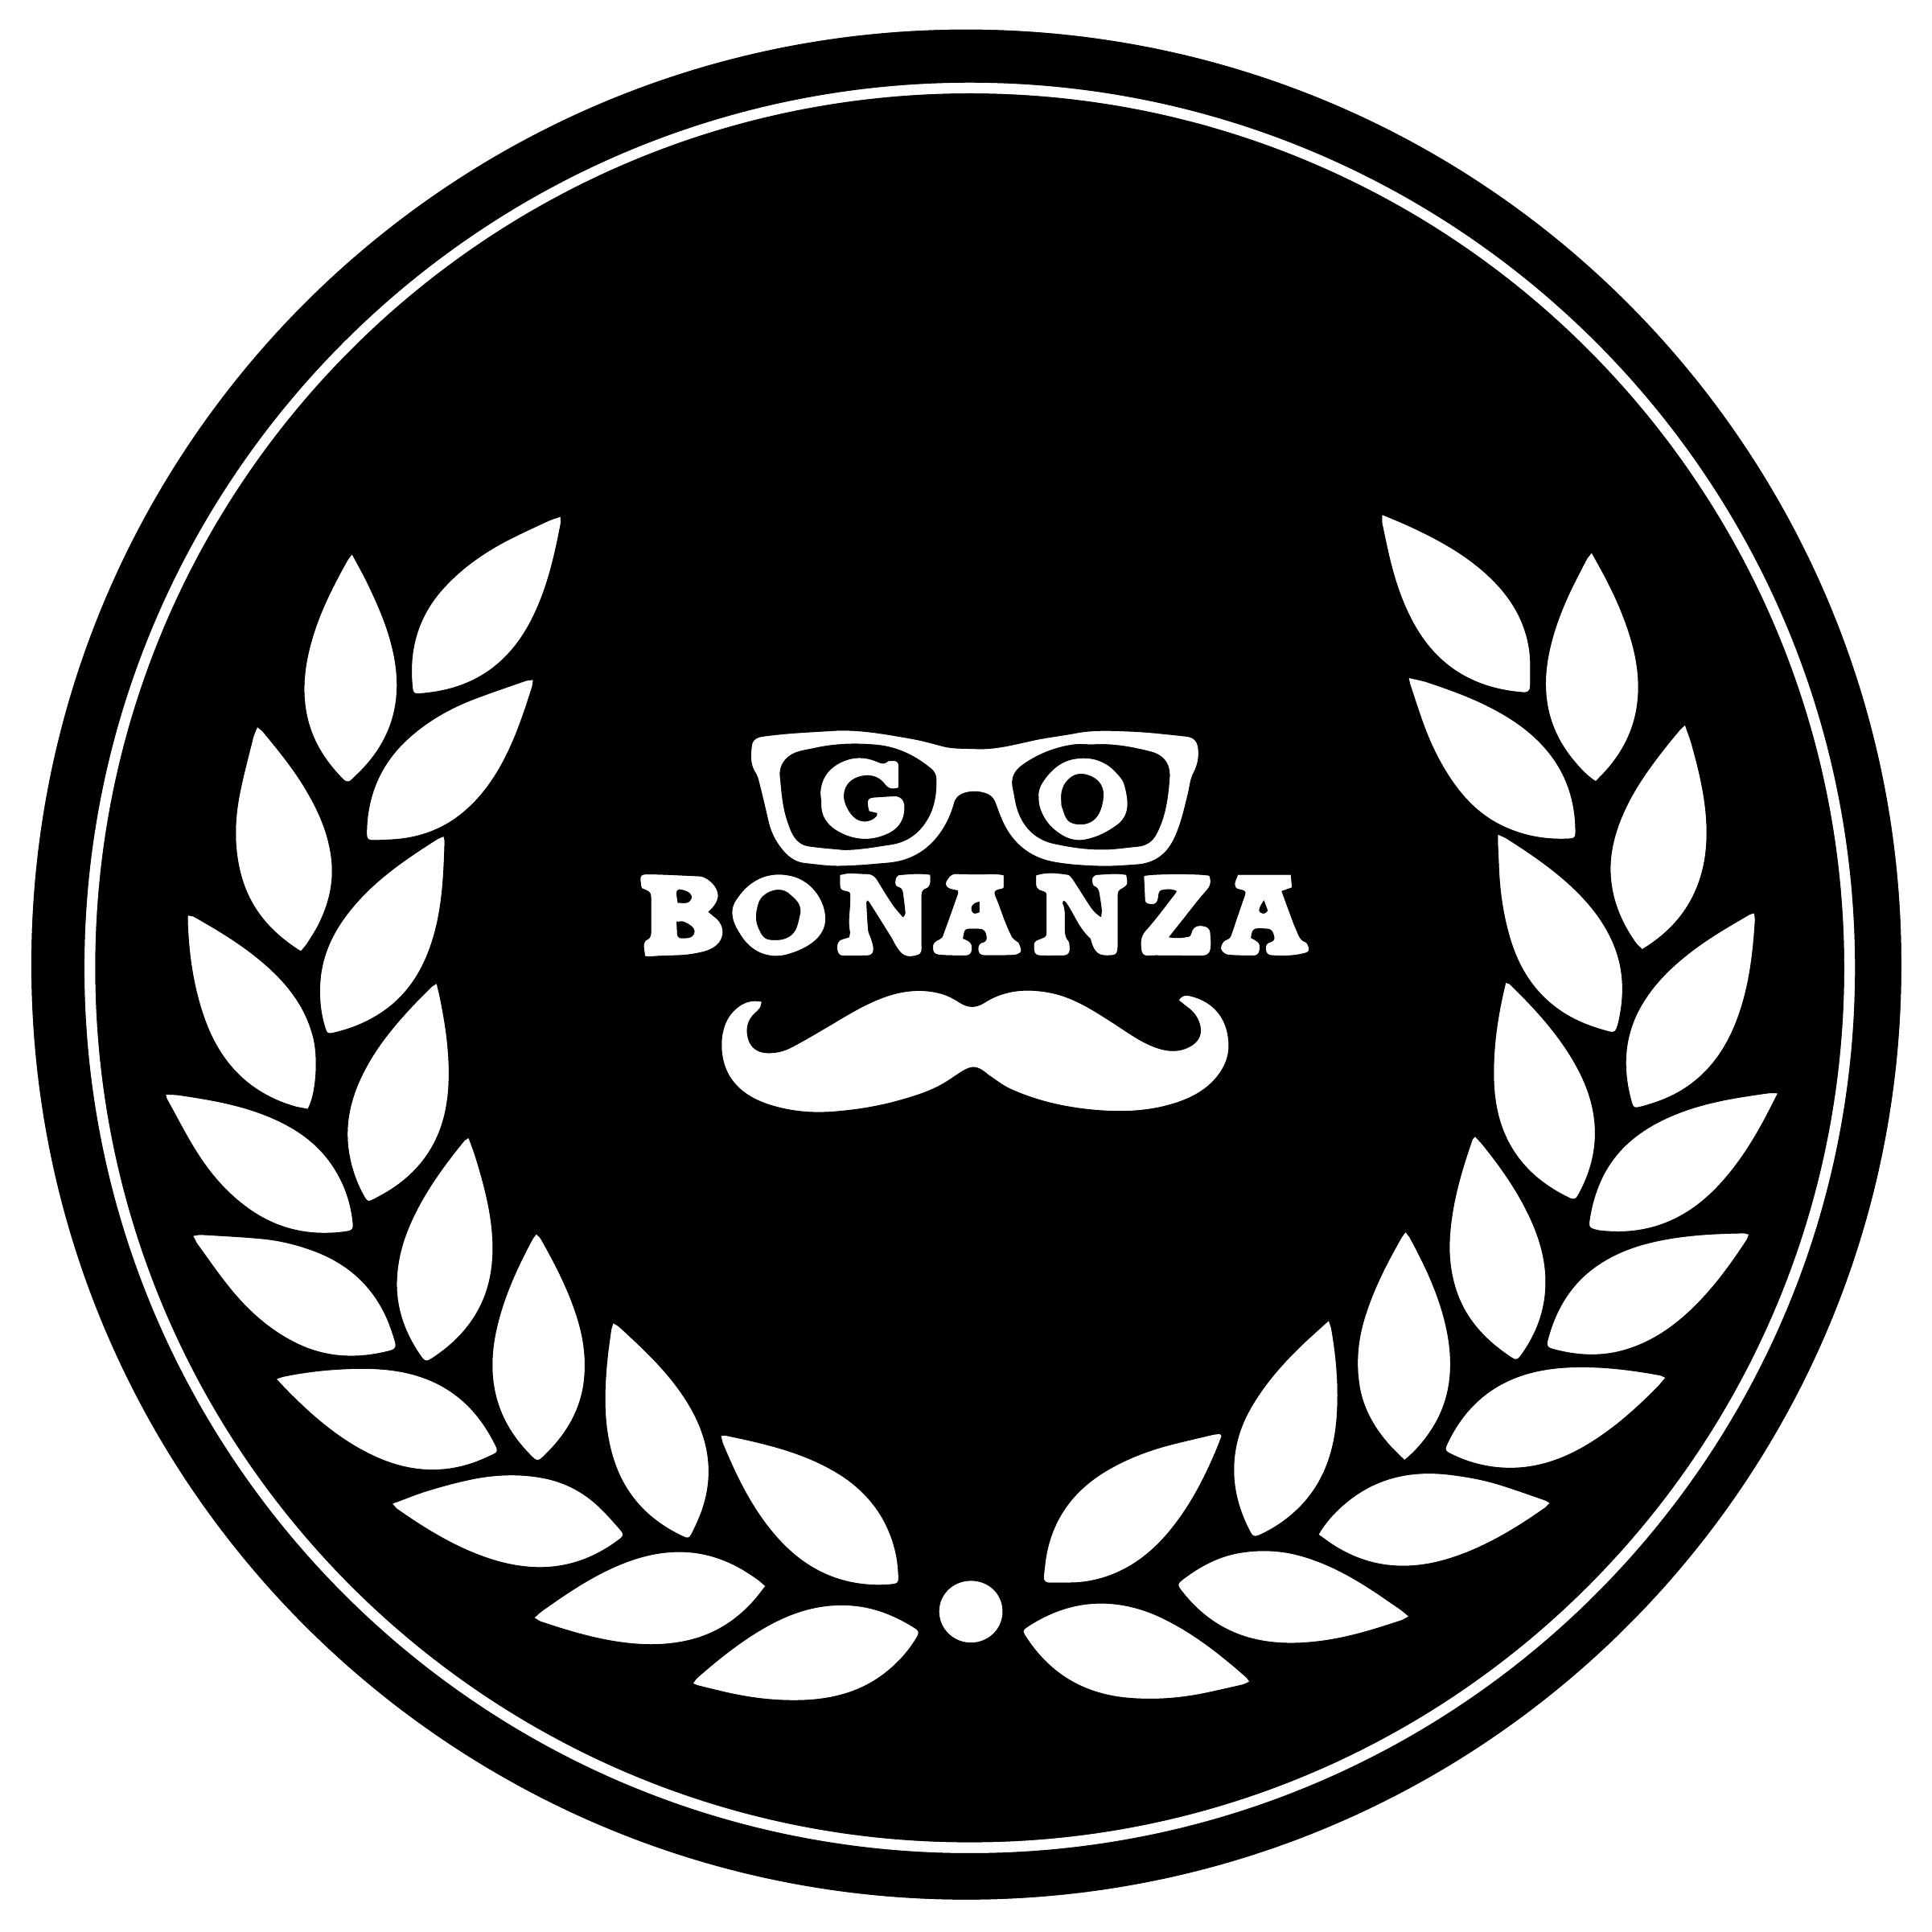 GoBonanza-decal-01.png